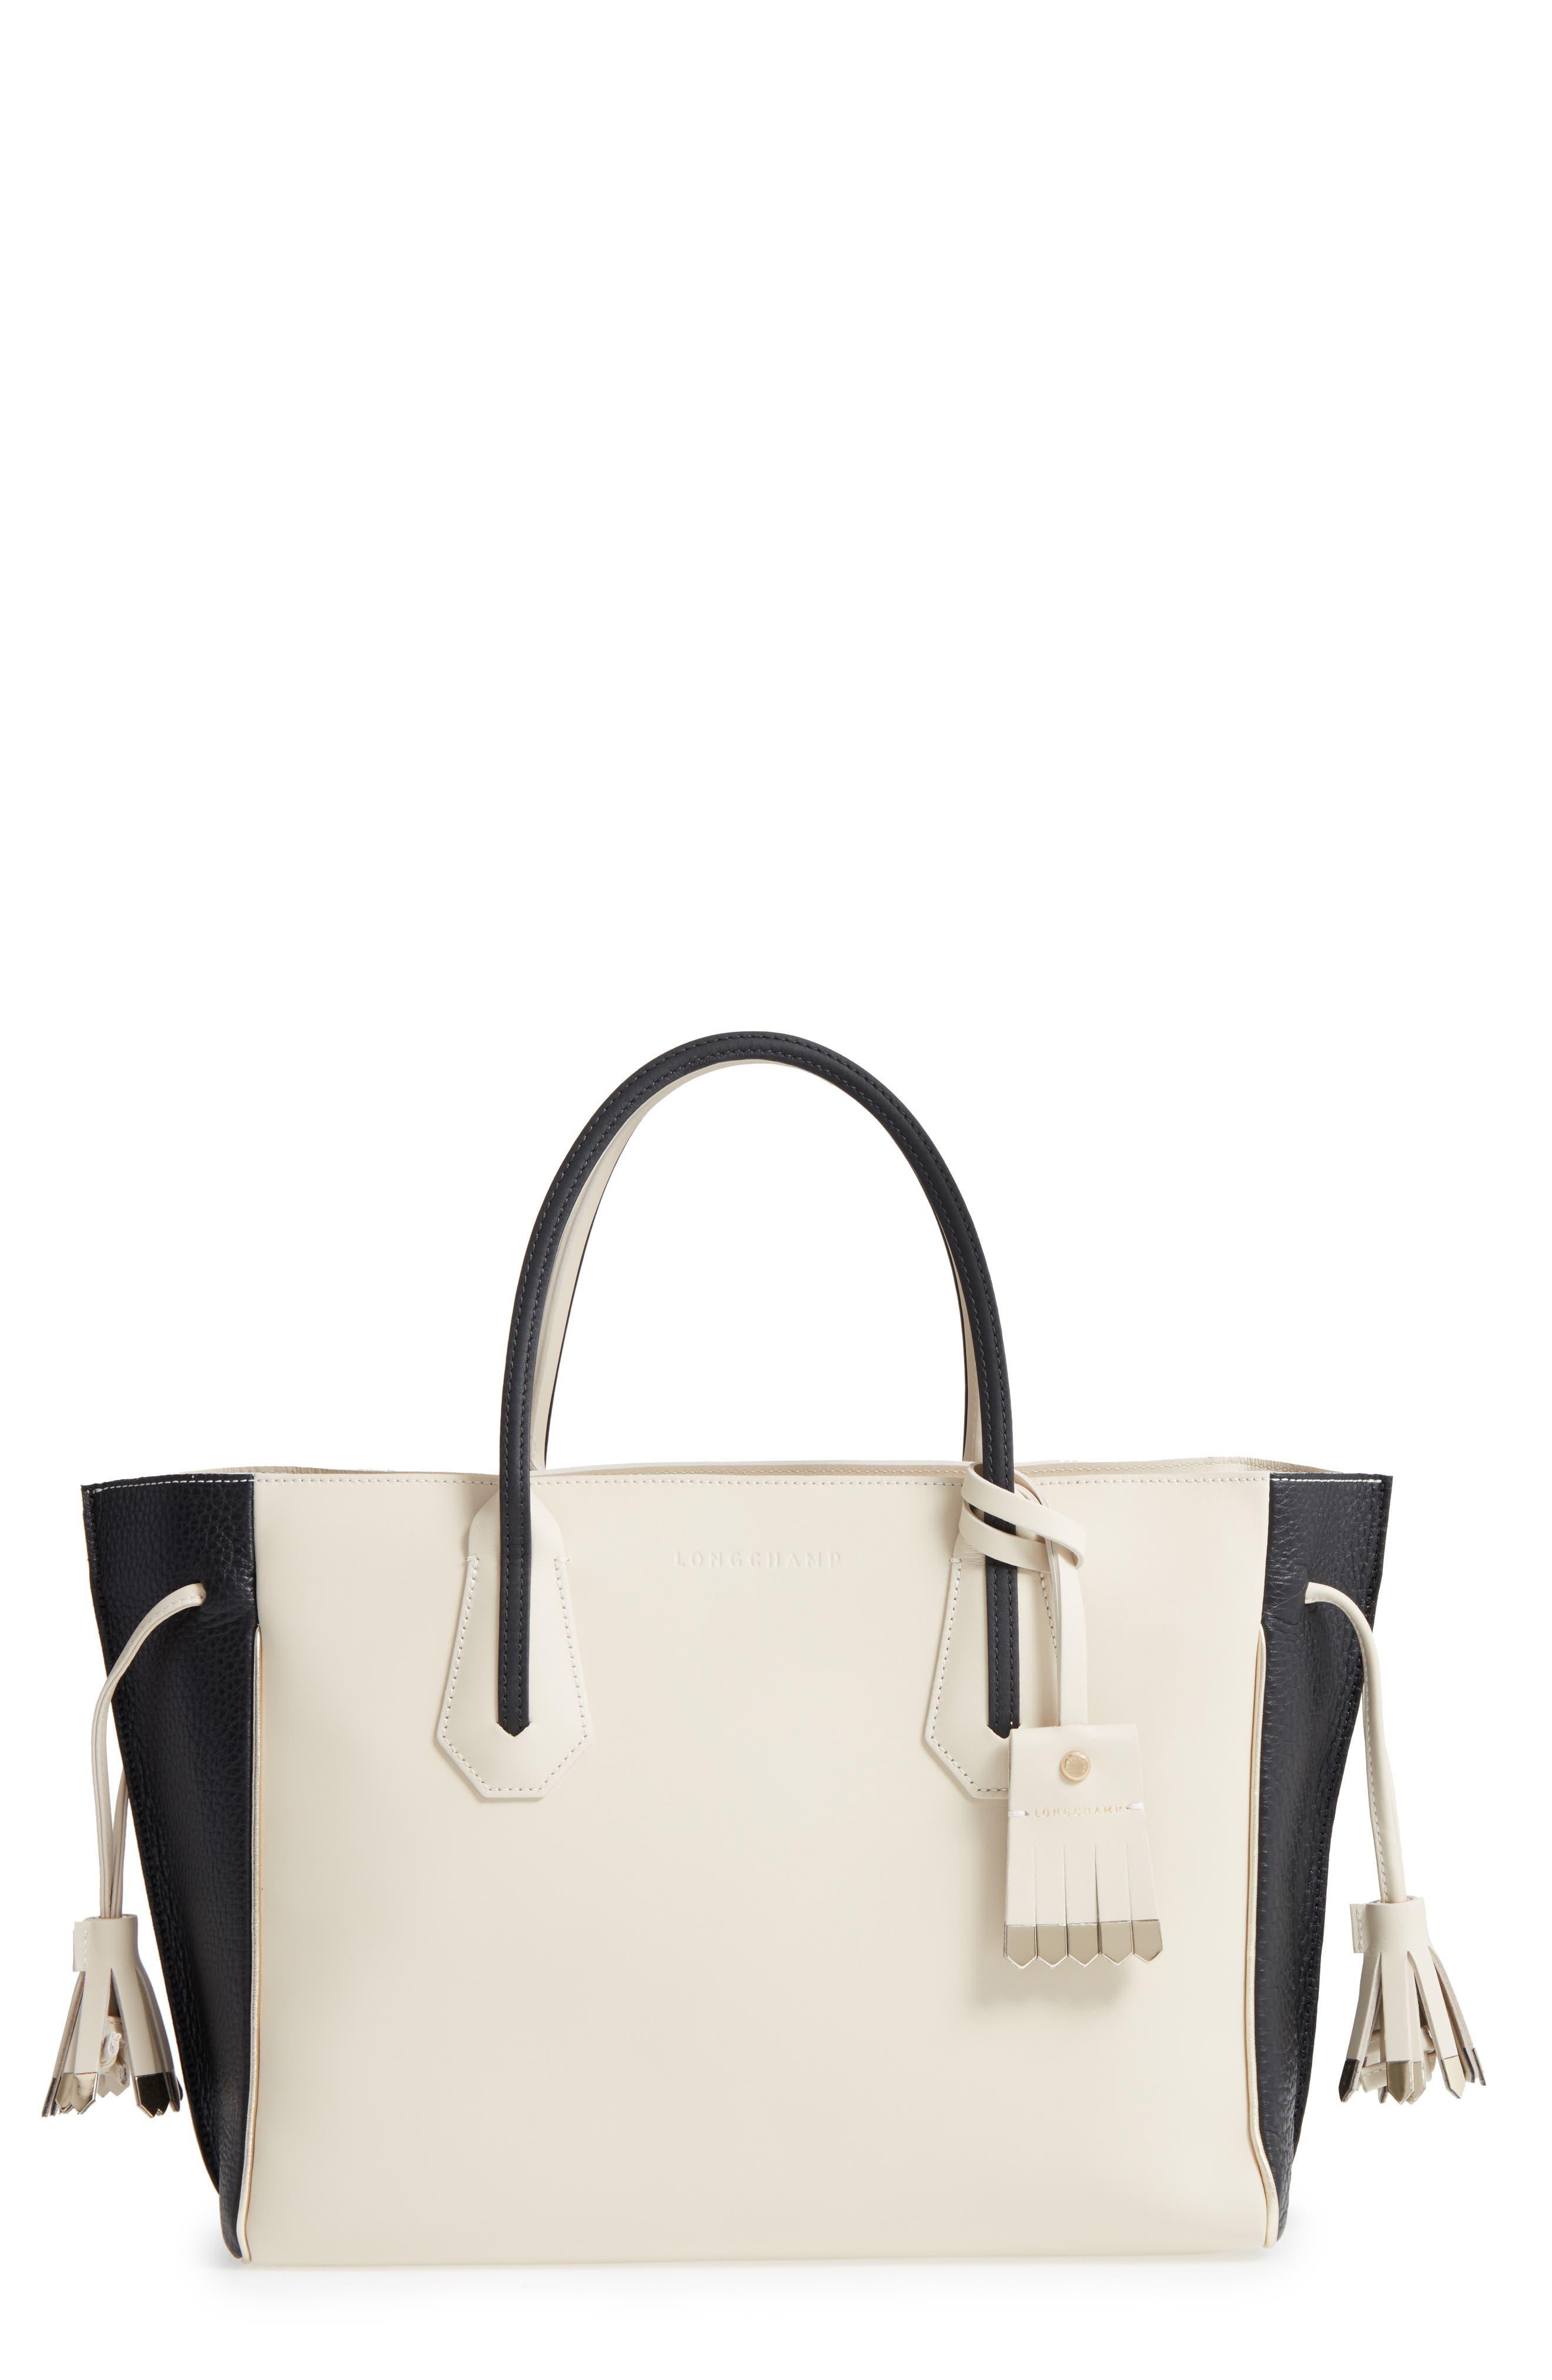 Main Image - Longchamp Medium Penelope Fantasie Luxe Leather Tote